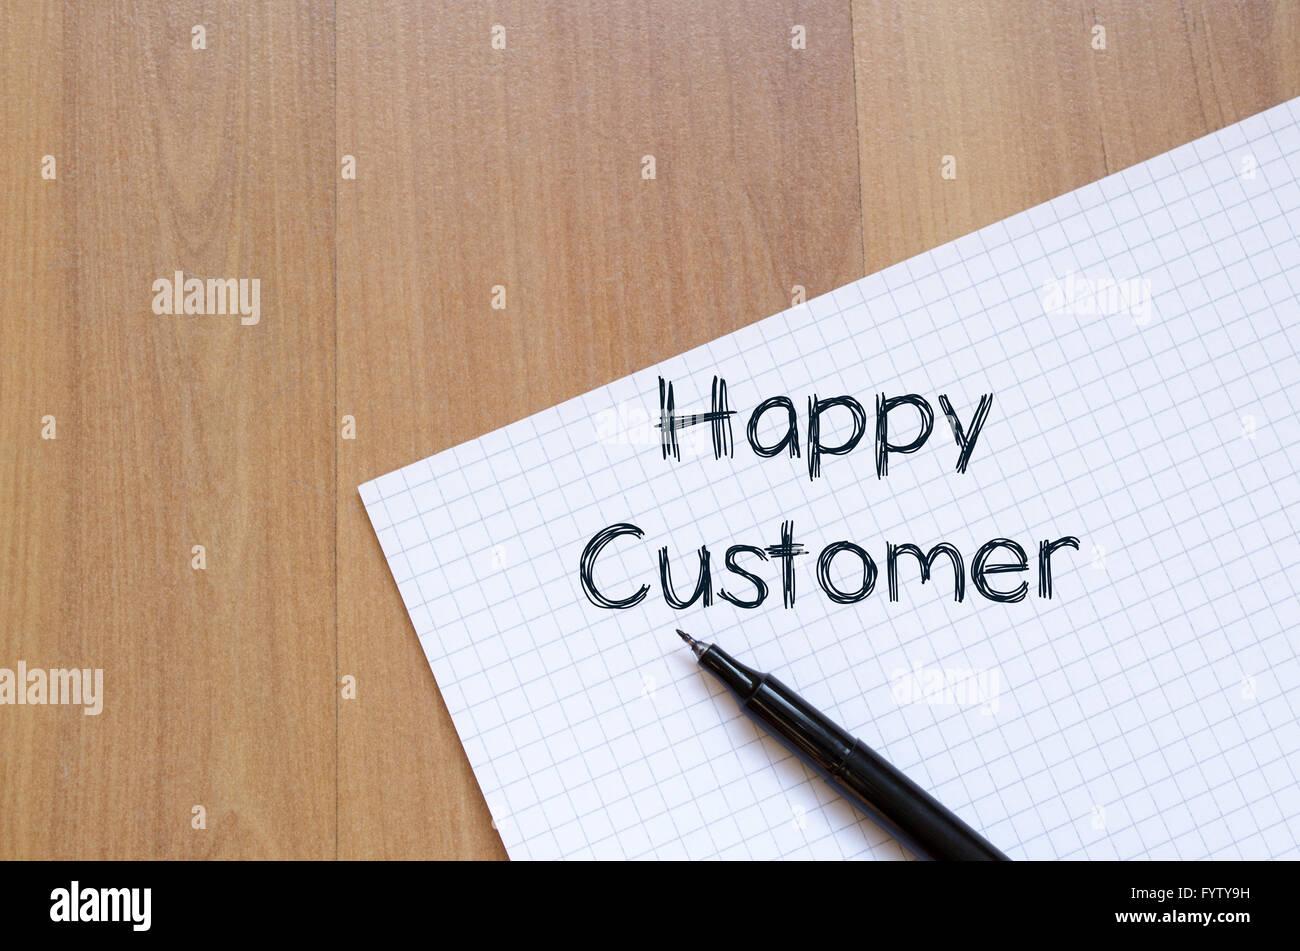 Happy customer write on notebook - Stock Image